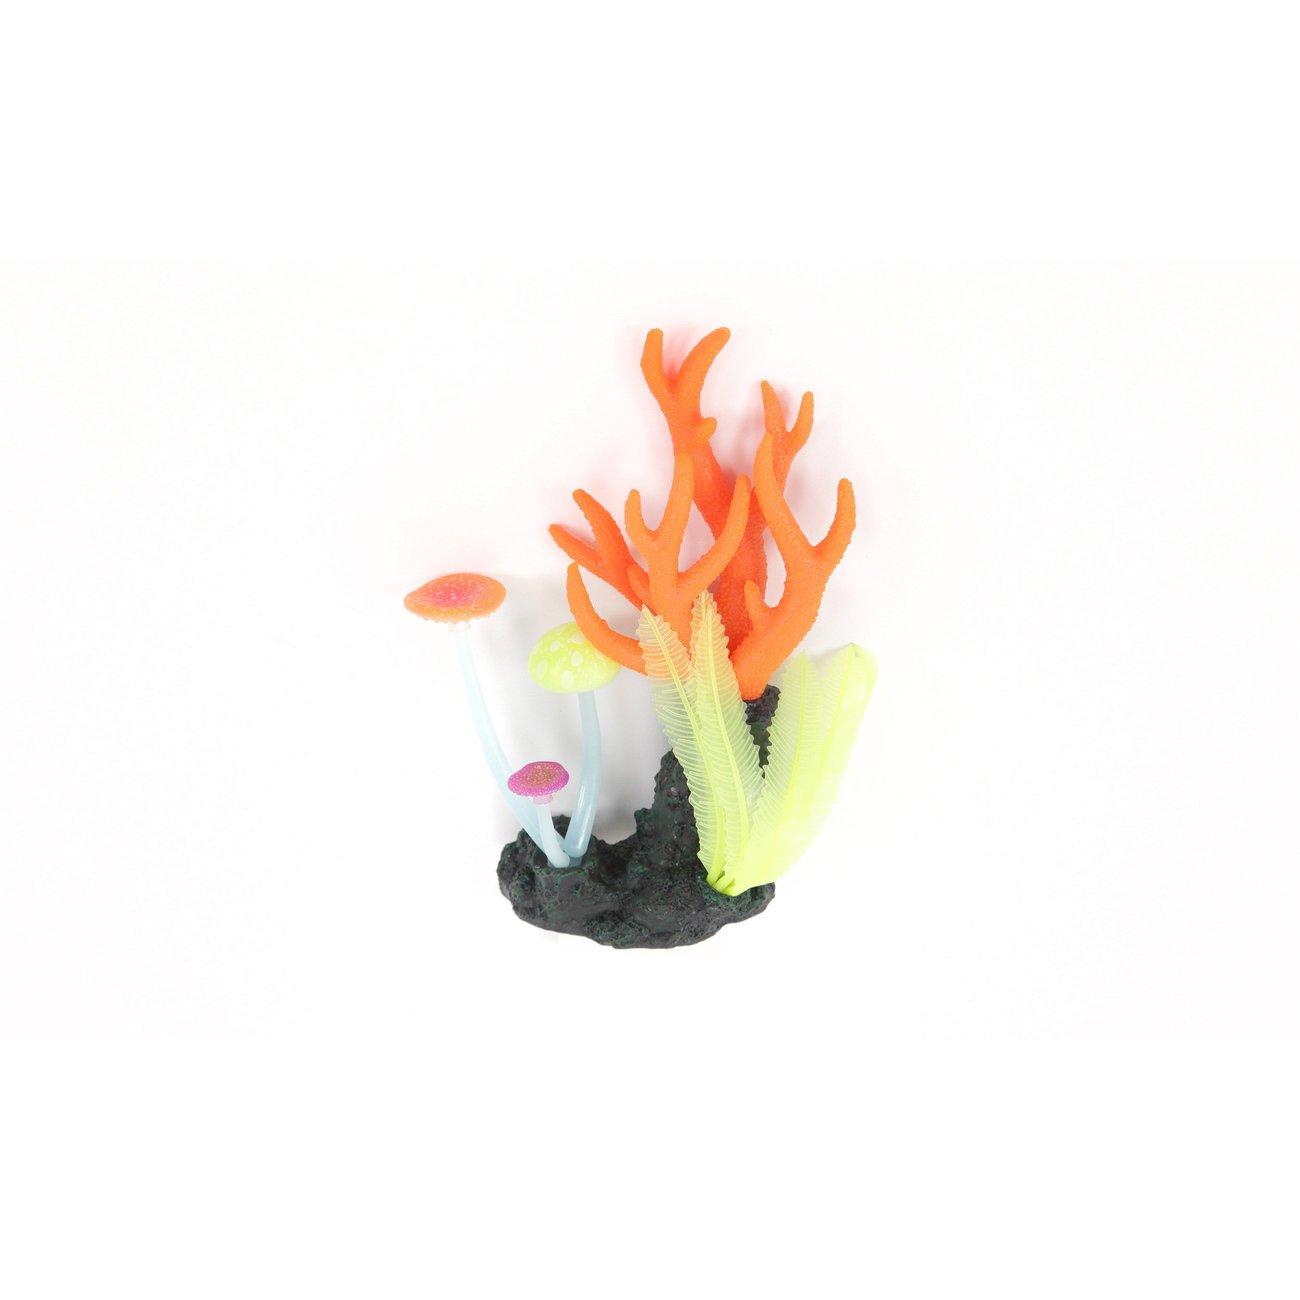 Aquatlantis Aqua Glow Koralle, Bild 5